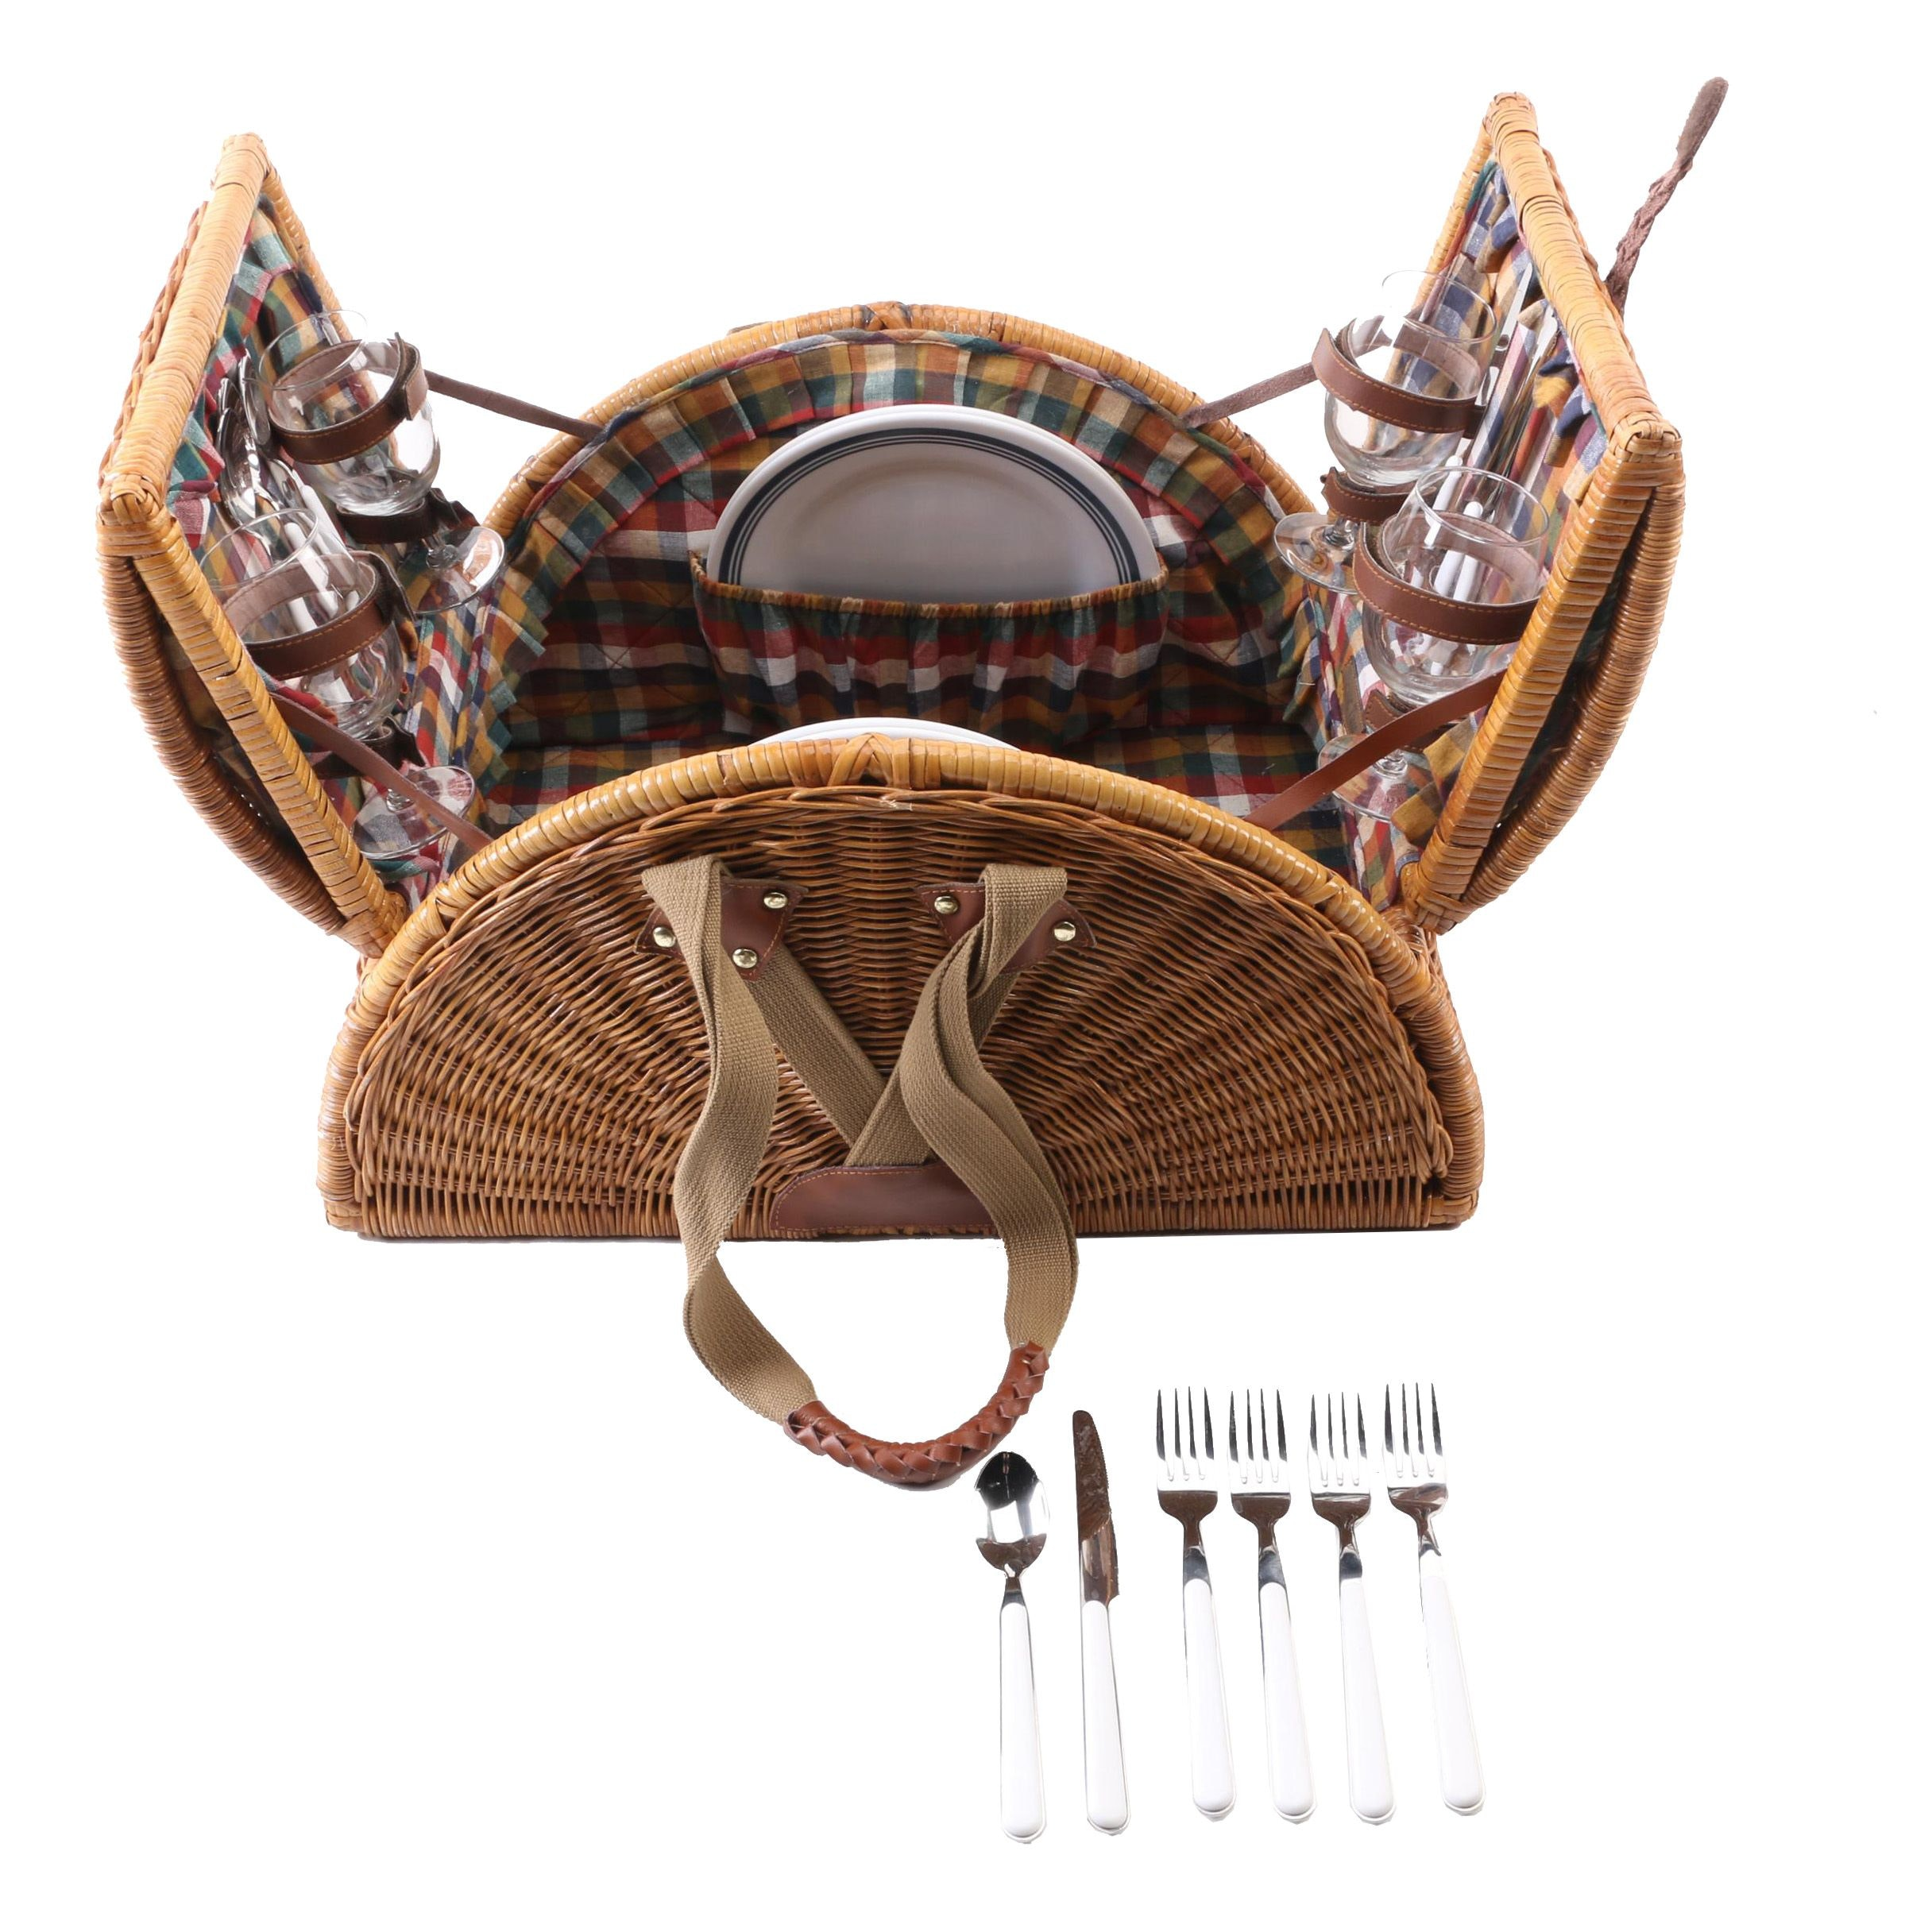 """Ritz Carlton Club"" Wicker Picnic Basket with Accessories"